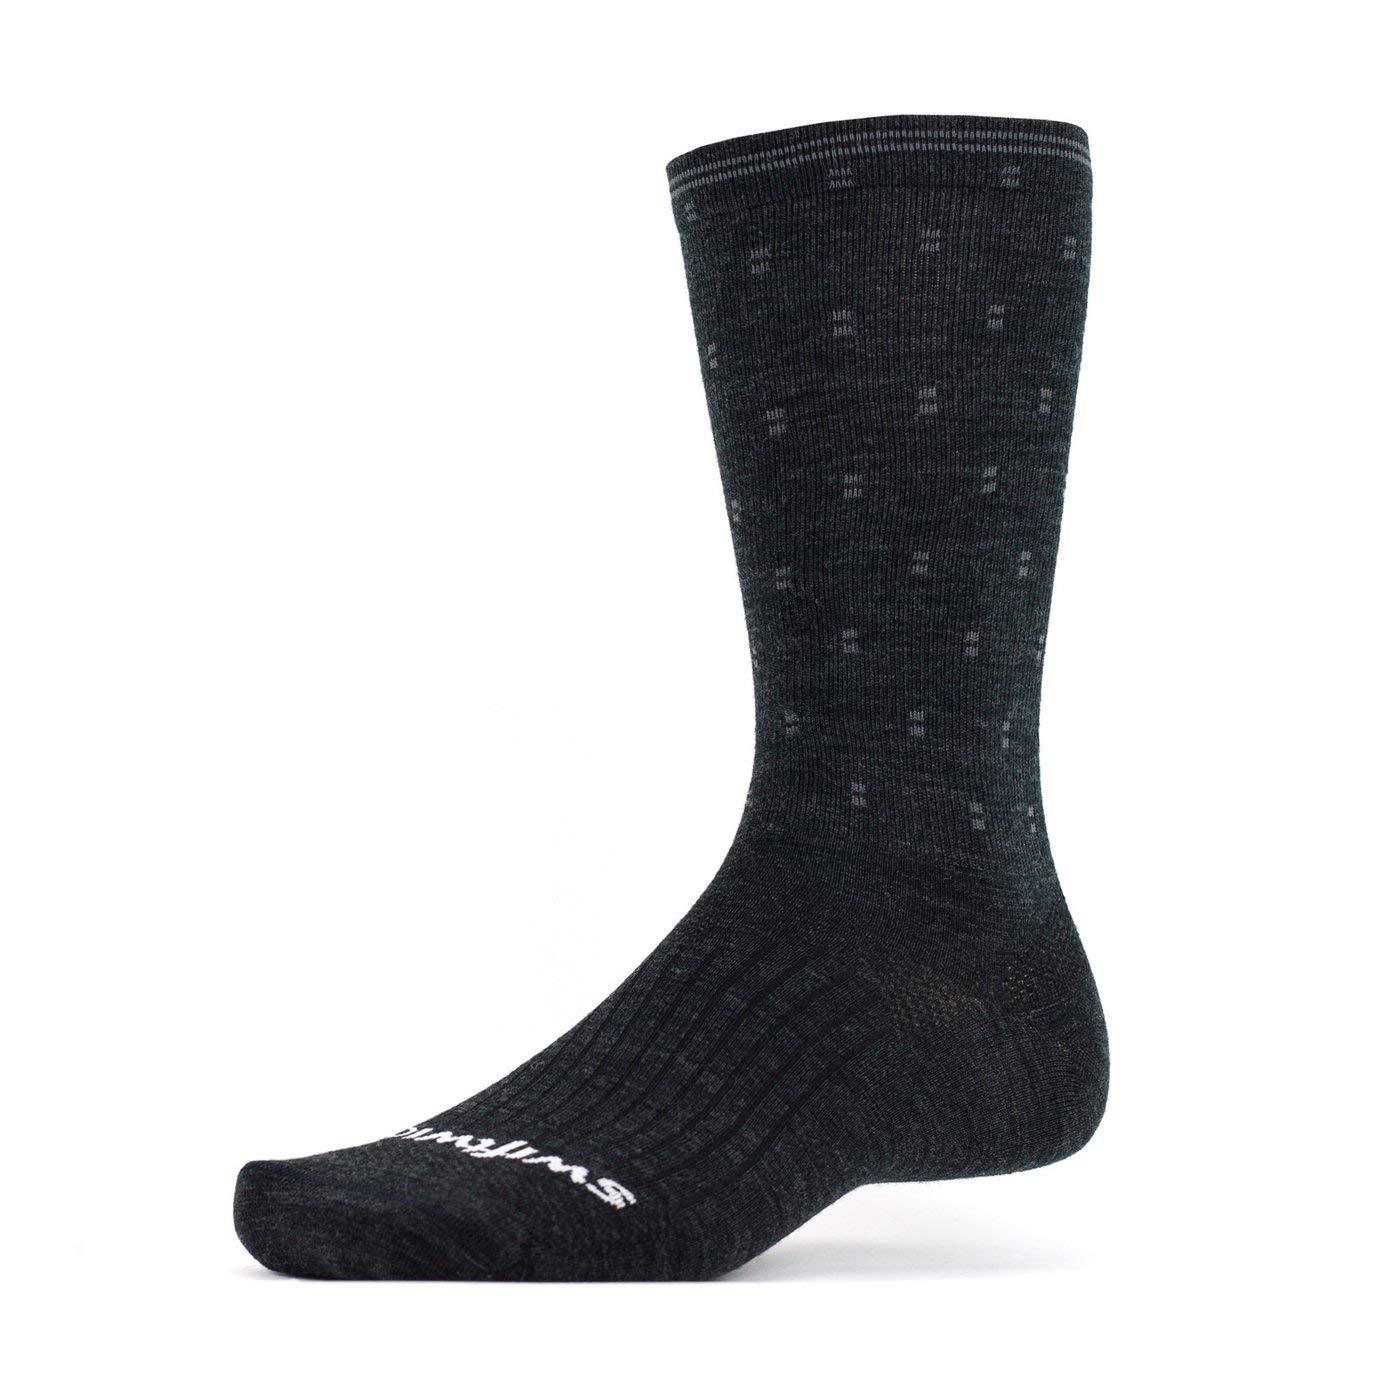 Breathable Compression Socks Swiftwick PURSUIT BUSINESS EIGHT Soft Merino Wool Dress Socks